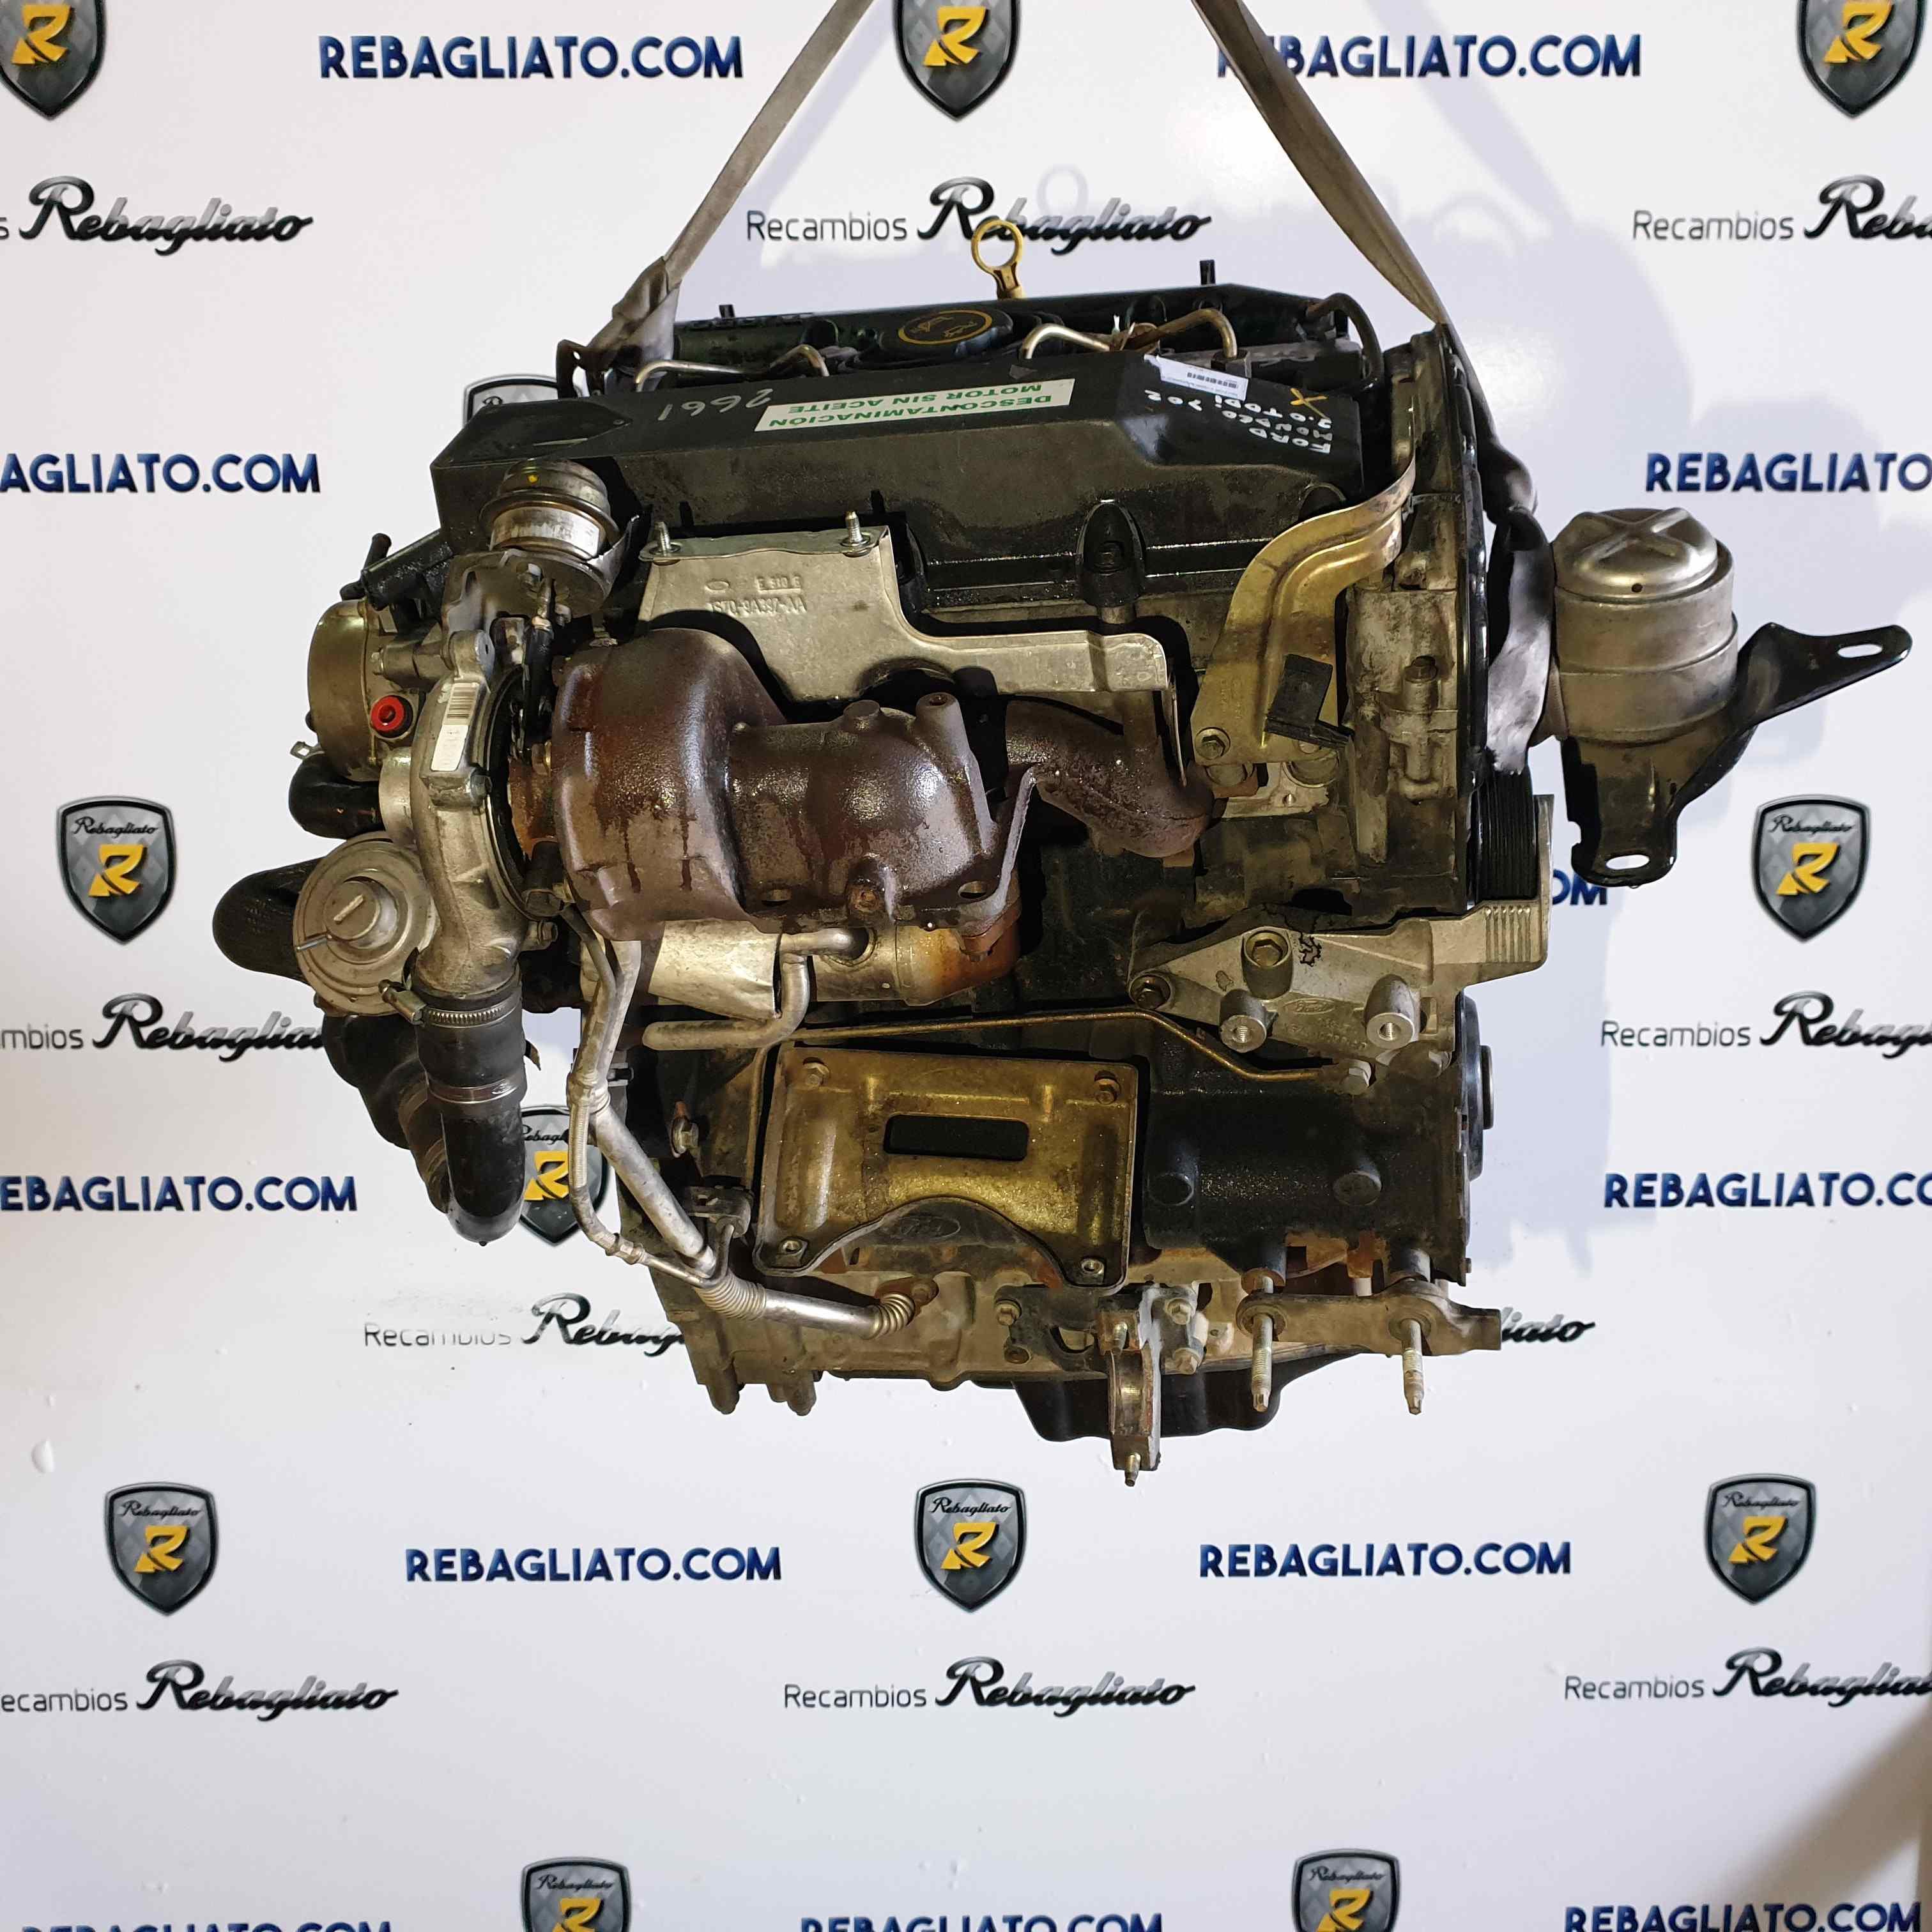 Motor completo de Ford Mondeo berlina (ge) (2000 - 2007) D6BA